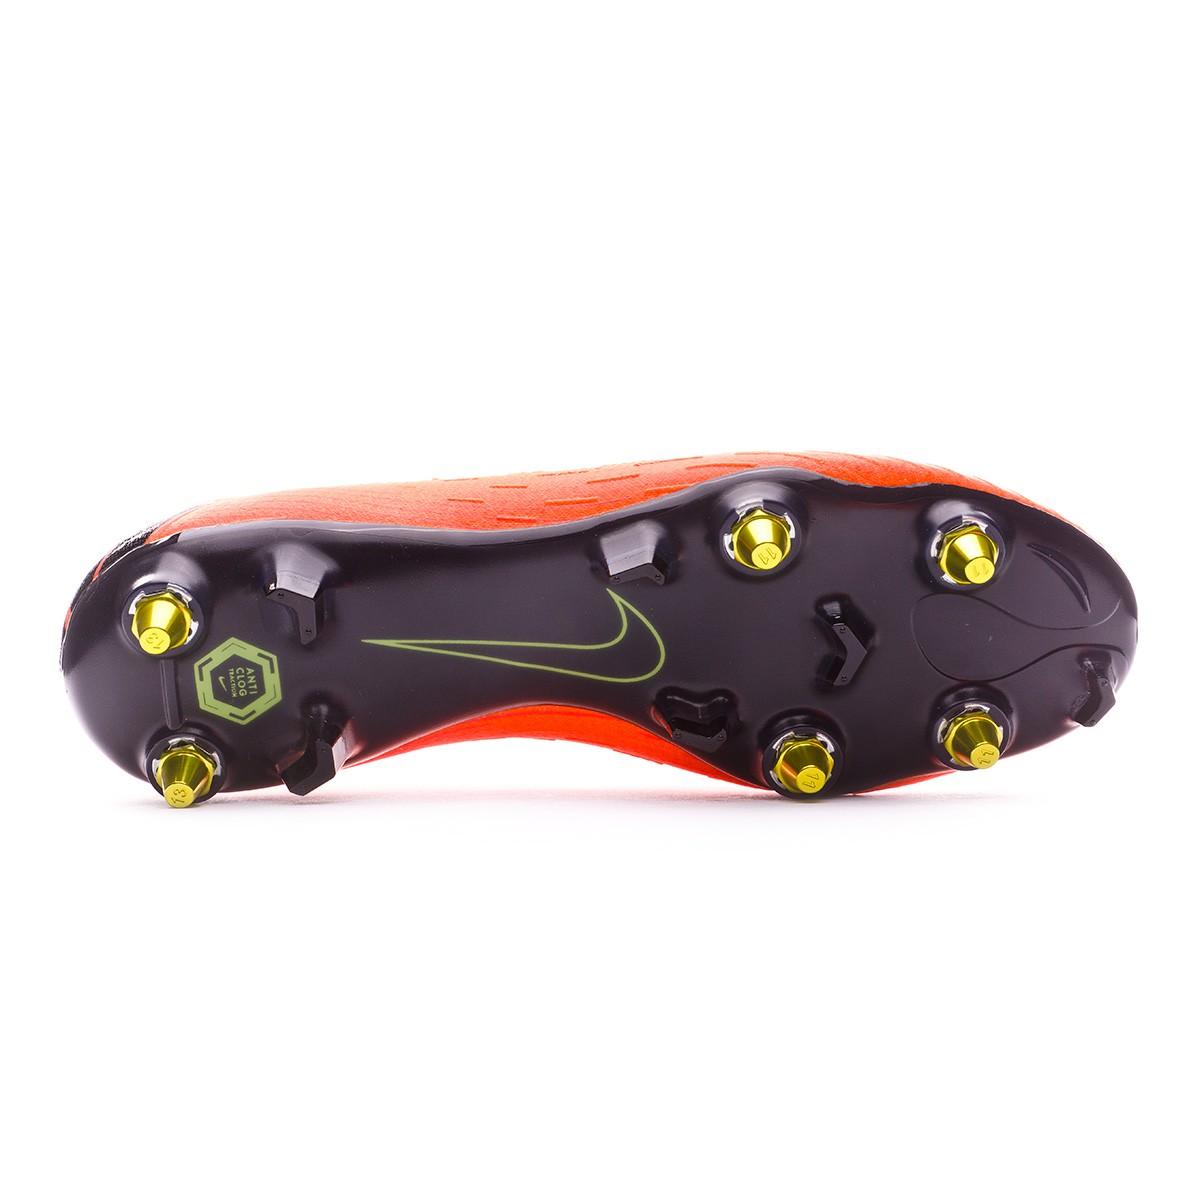 Boot Nike Mercurial Vapor XII Elite SG-Pro Anti-Clog Total  orange-Black-Volt - Football store Fútbol Emotion acab419ab